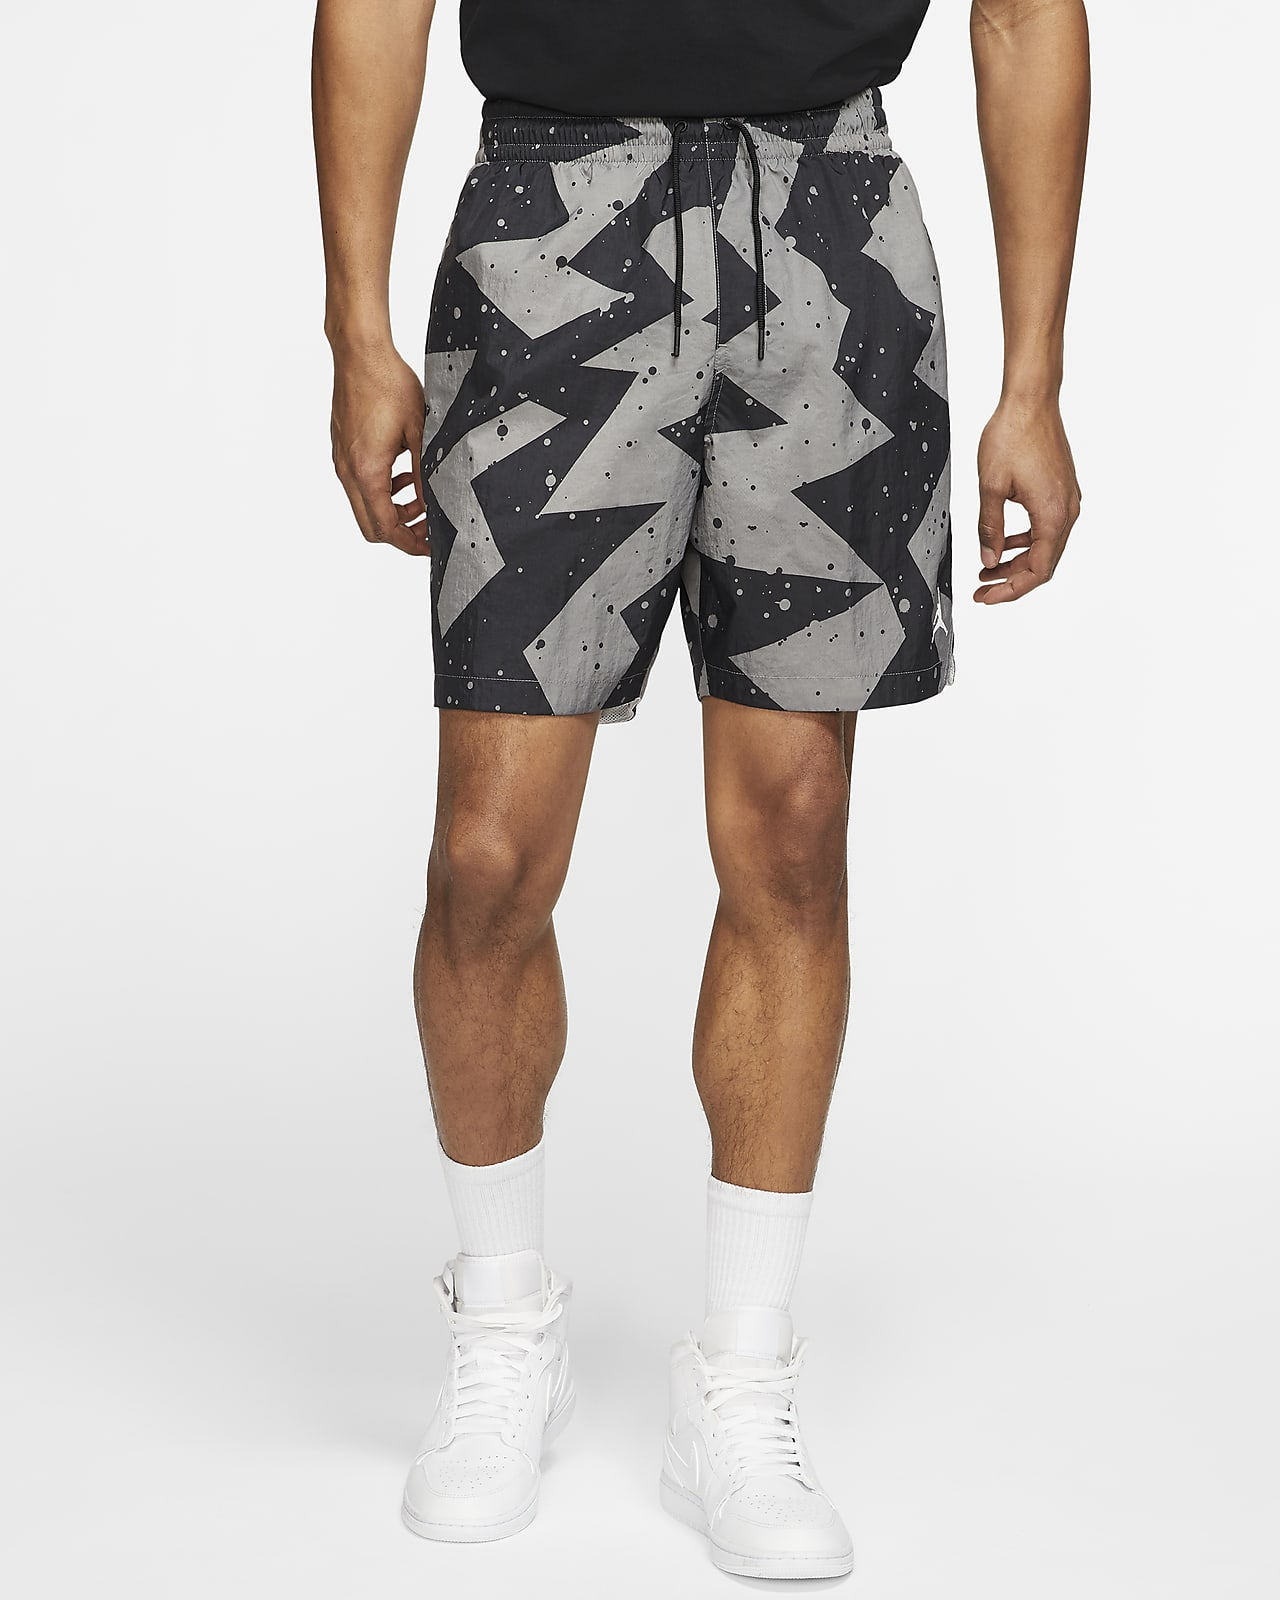 Jordan Poolside Pantalons curts de 18 cm - Home